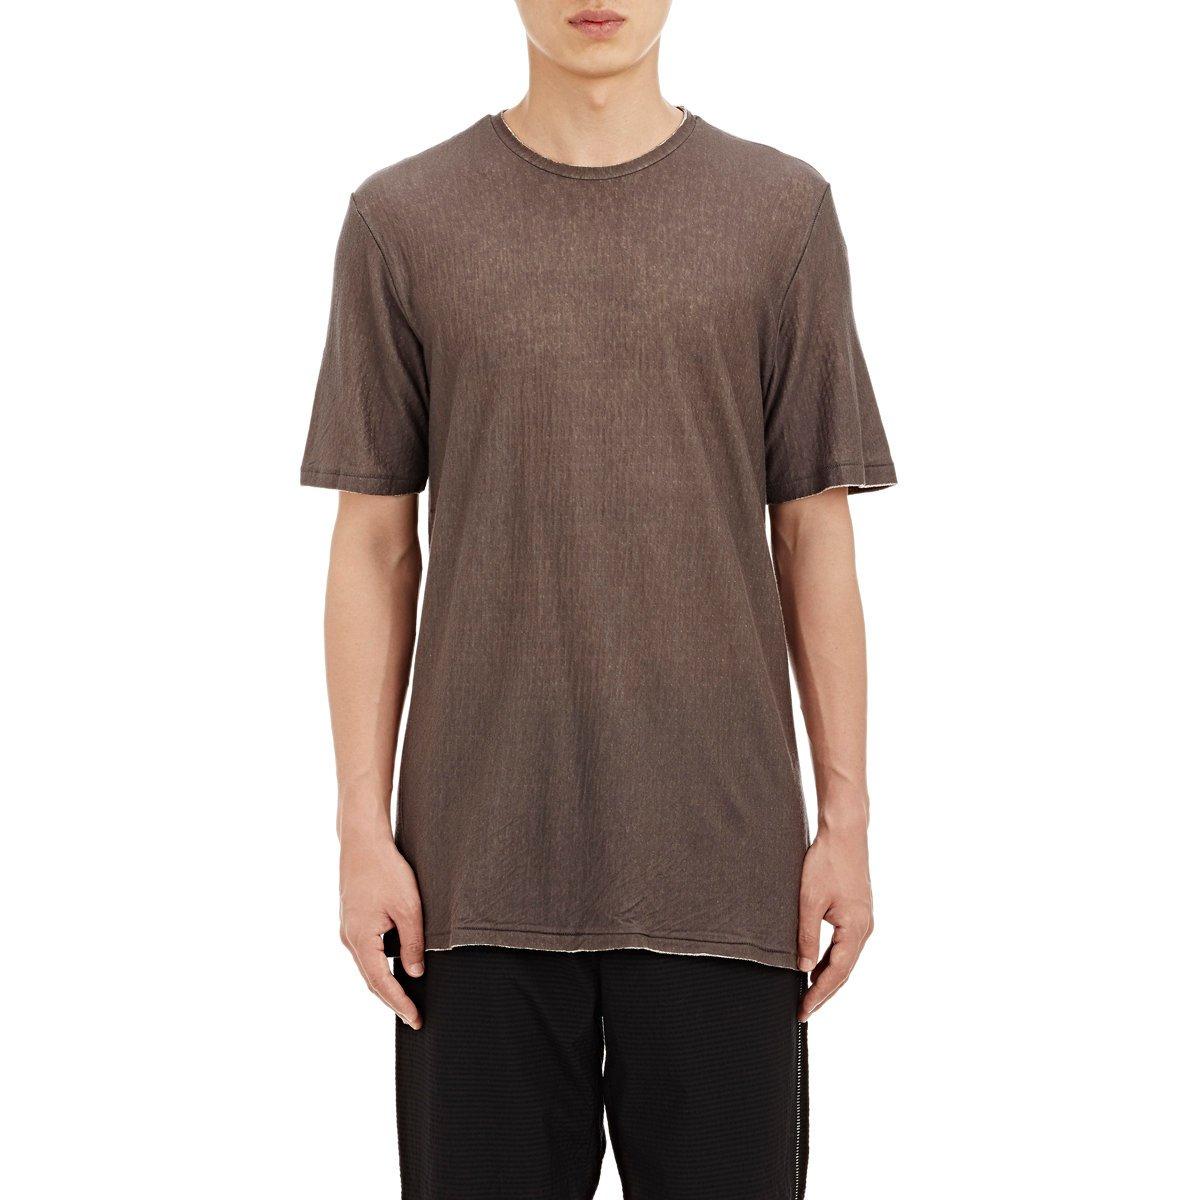 Rag bone rigby t shirt in gray for men lyst for Rag bone shirt